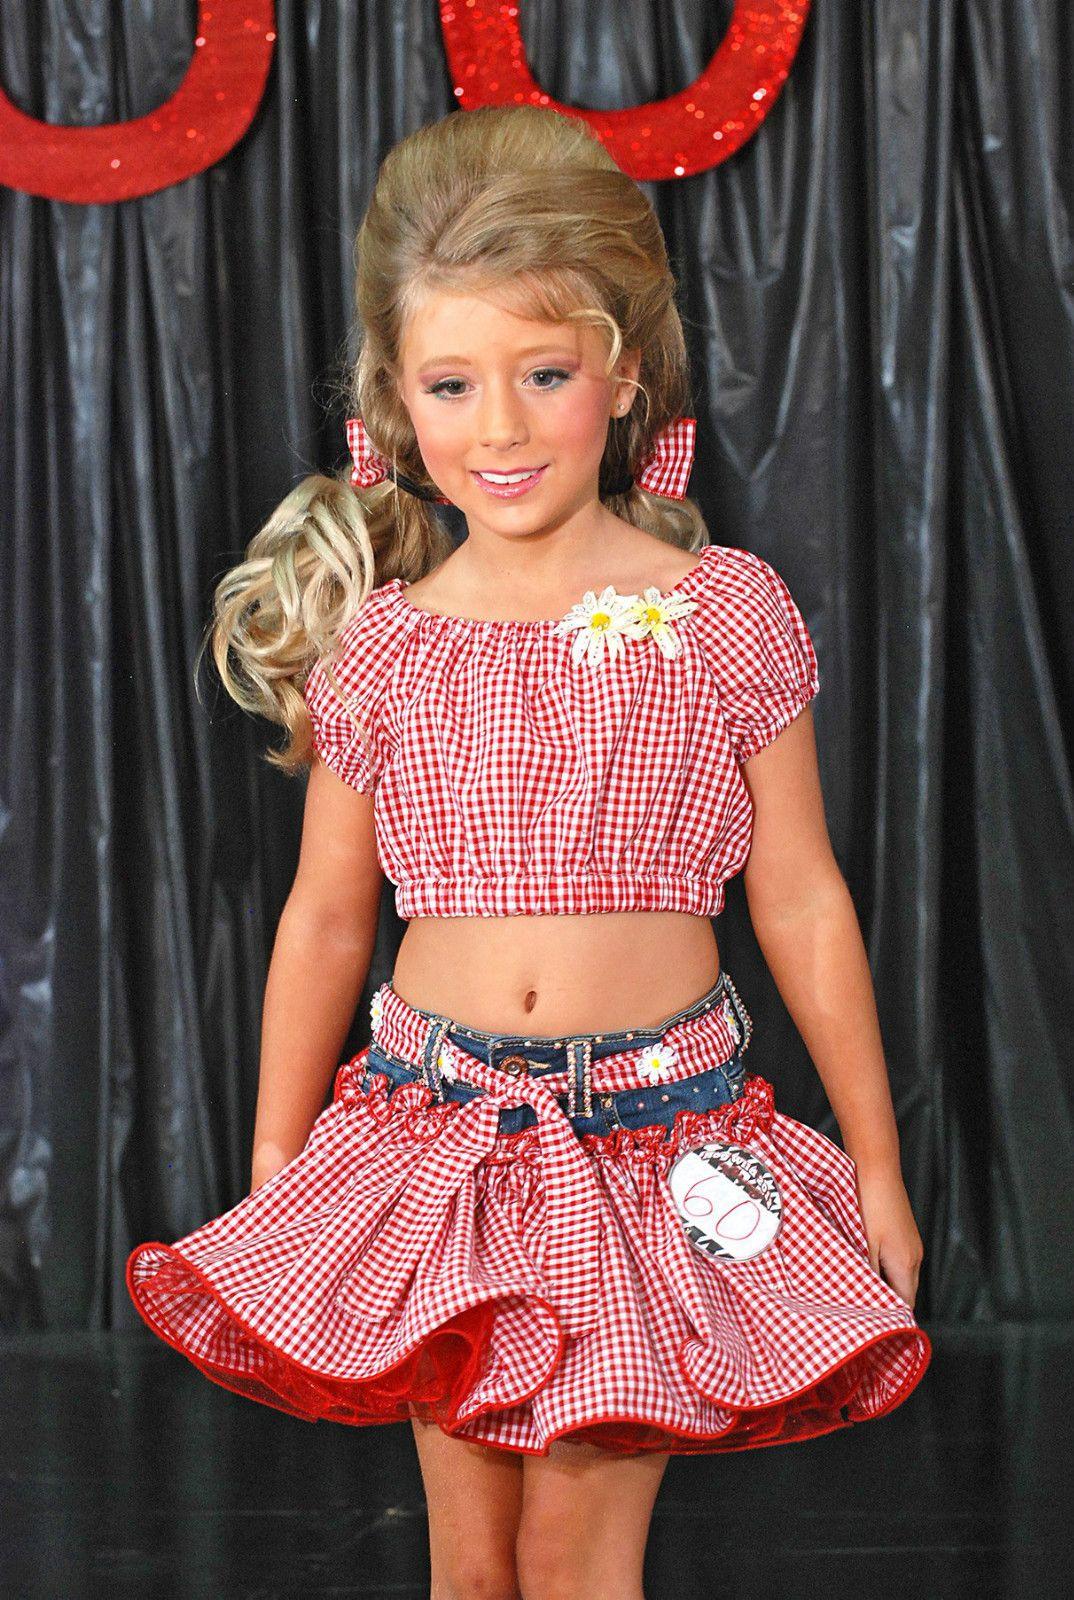 Daisy Duke Red & White, Glitz OOC Pageant Wear | Duke ...